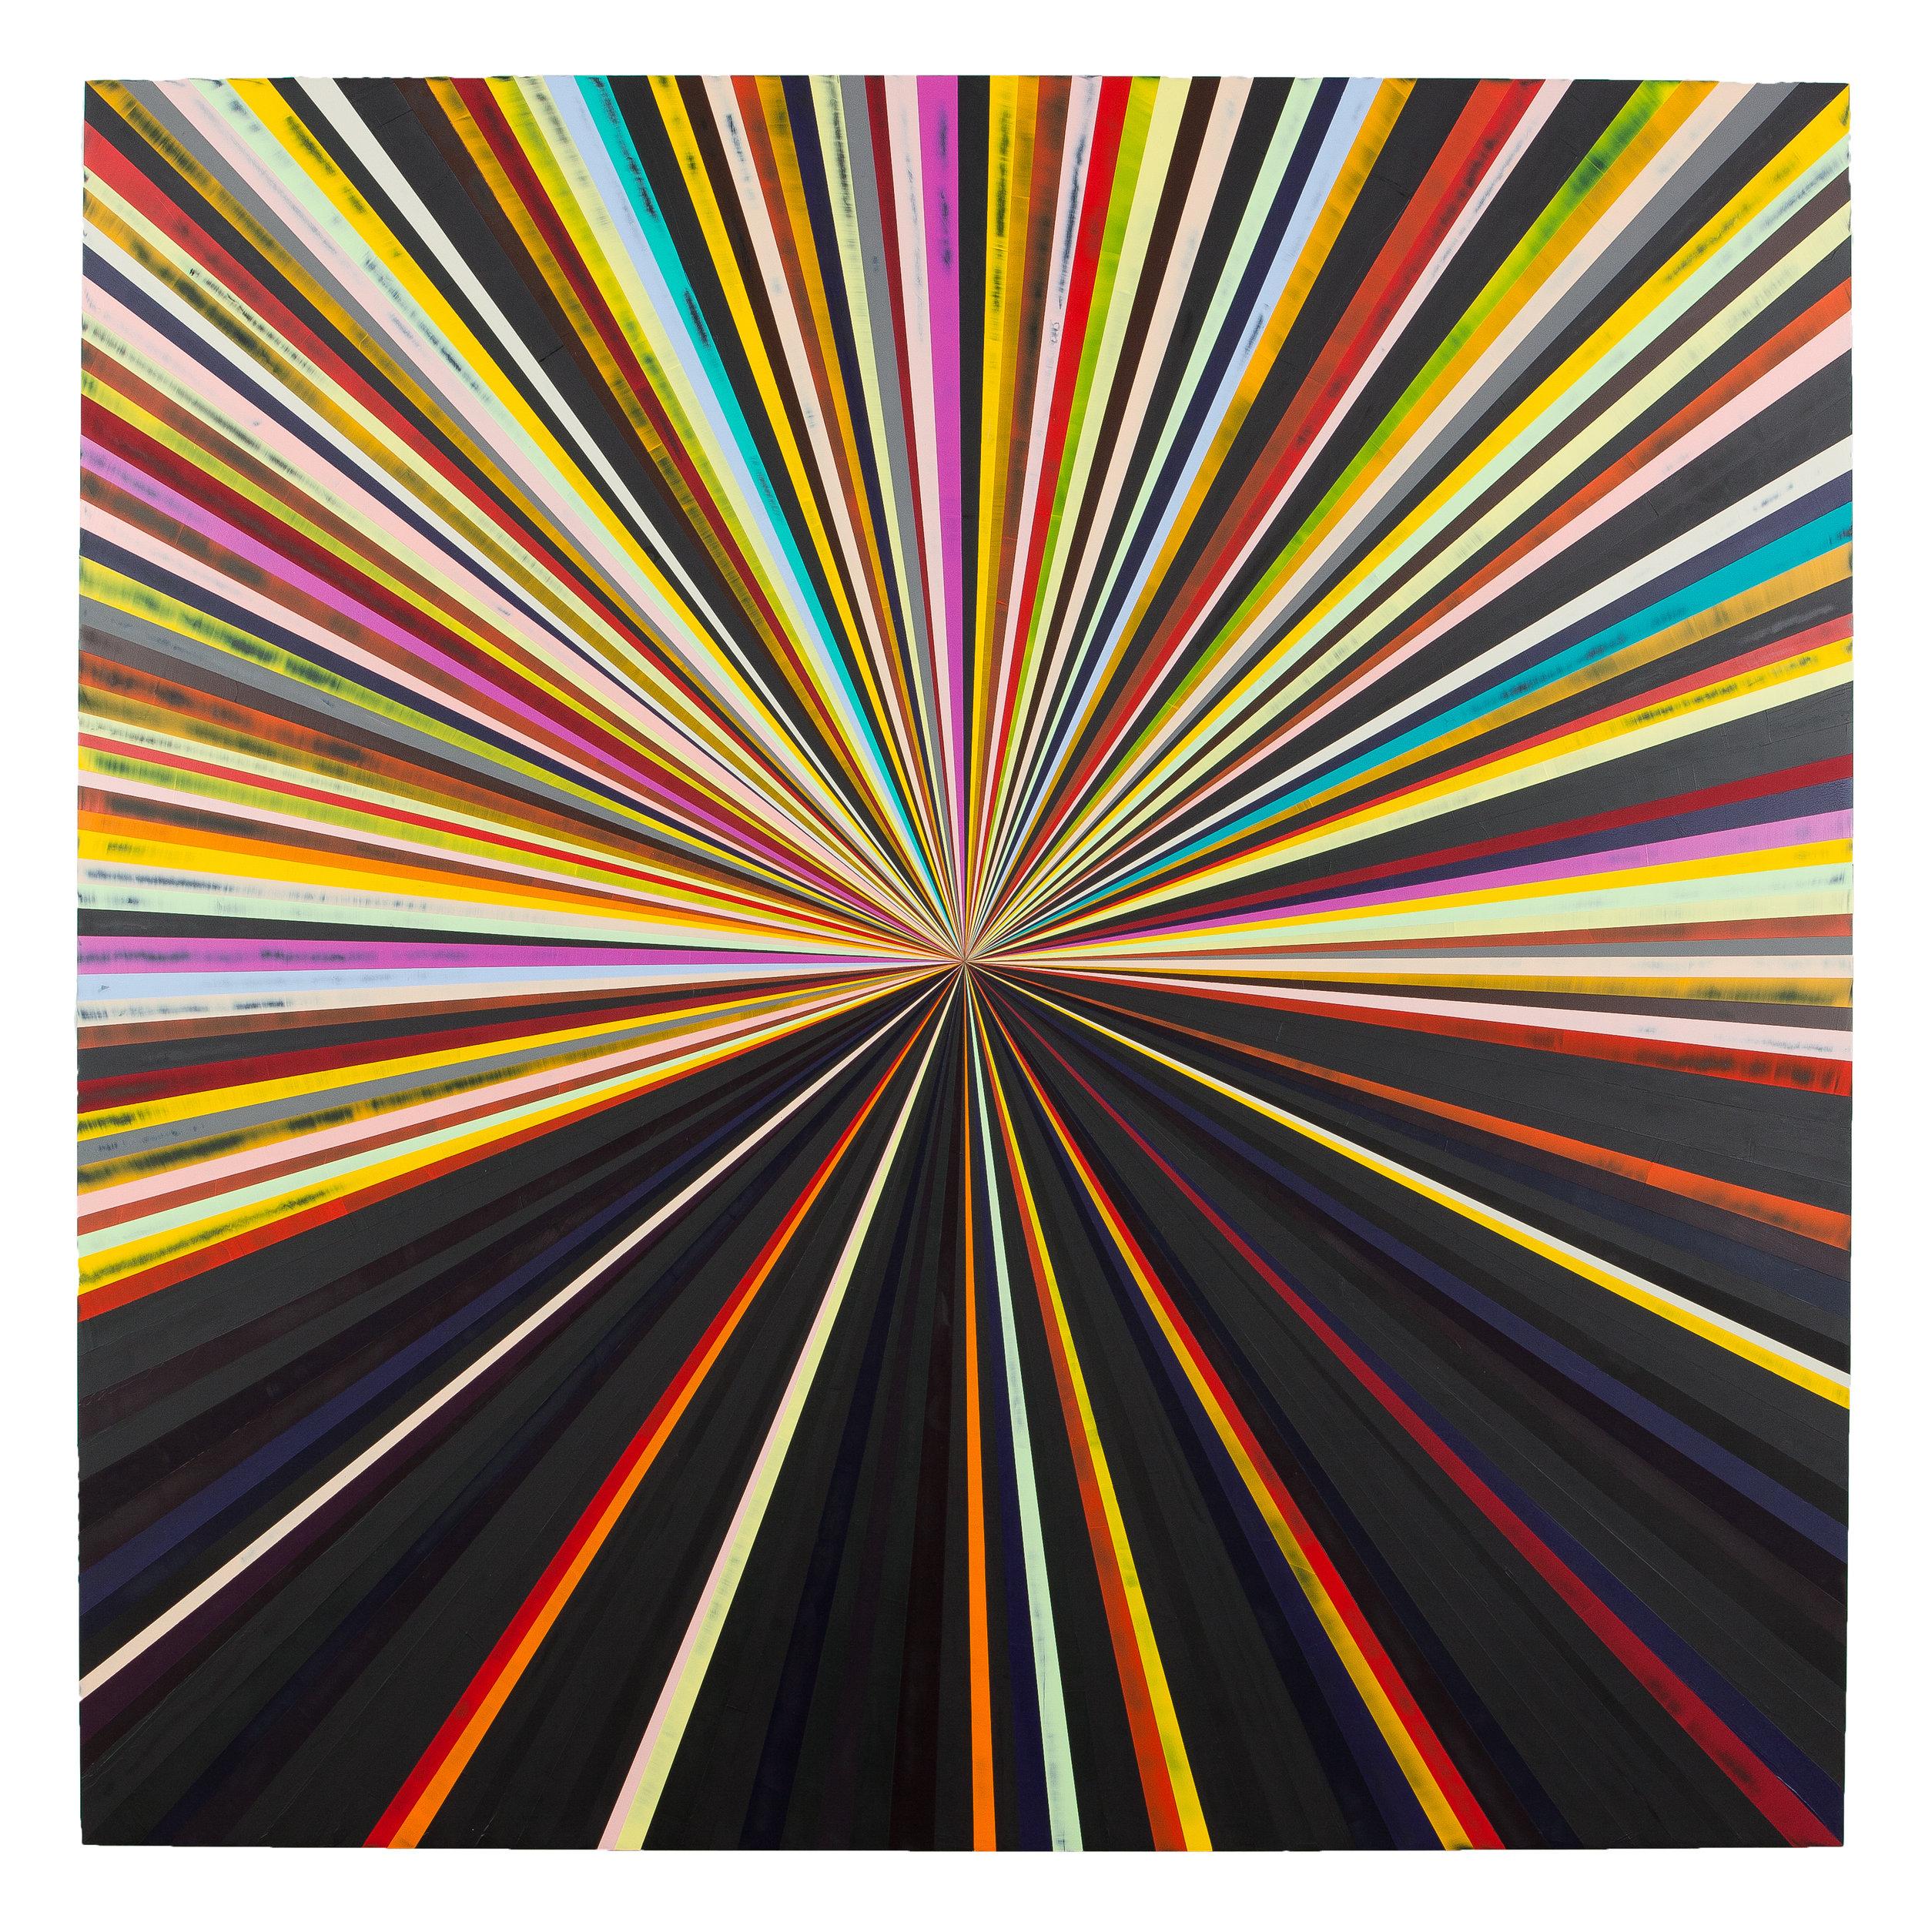 Kenton_Parker-152x152cm-Acrylic_On_Archival_Wood_Panel.jpg